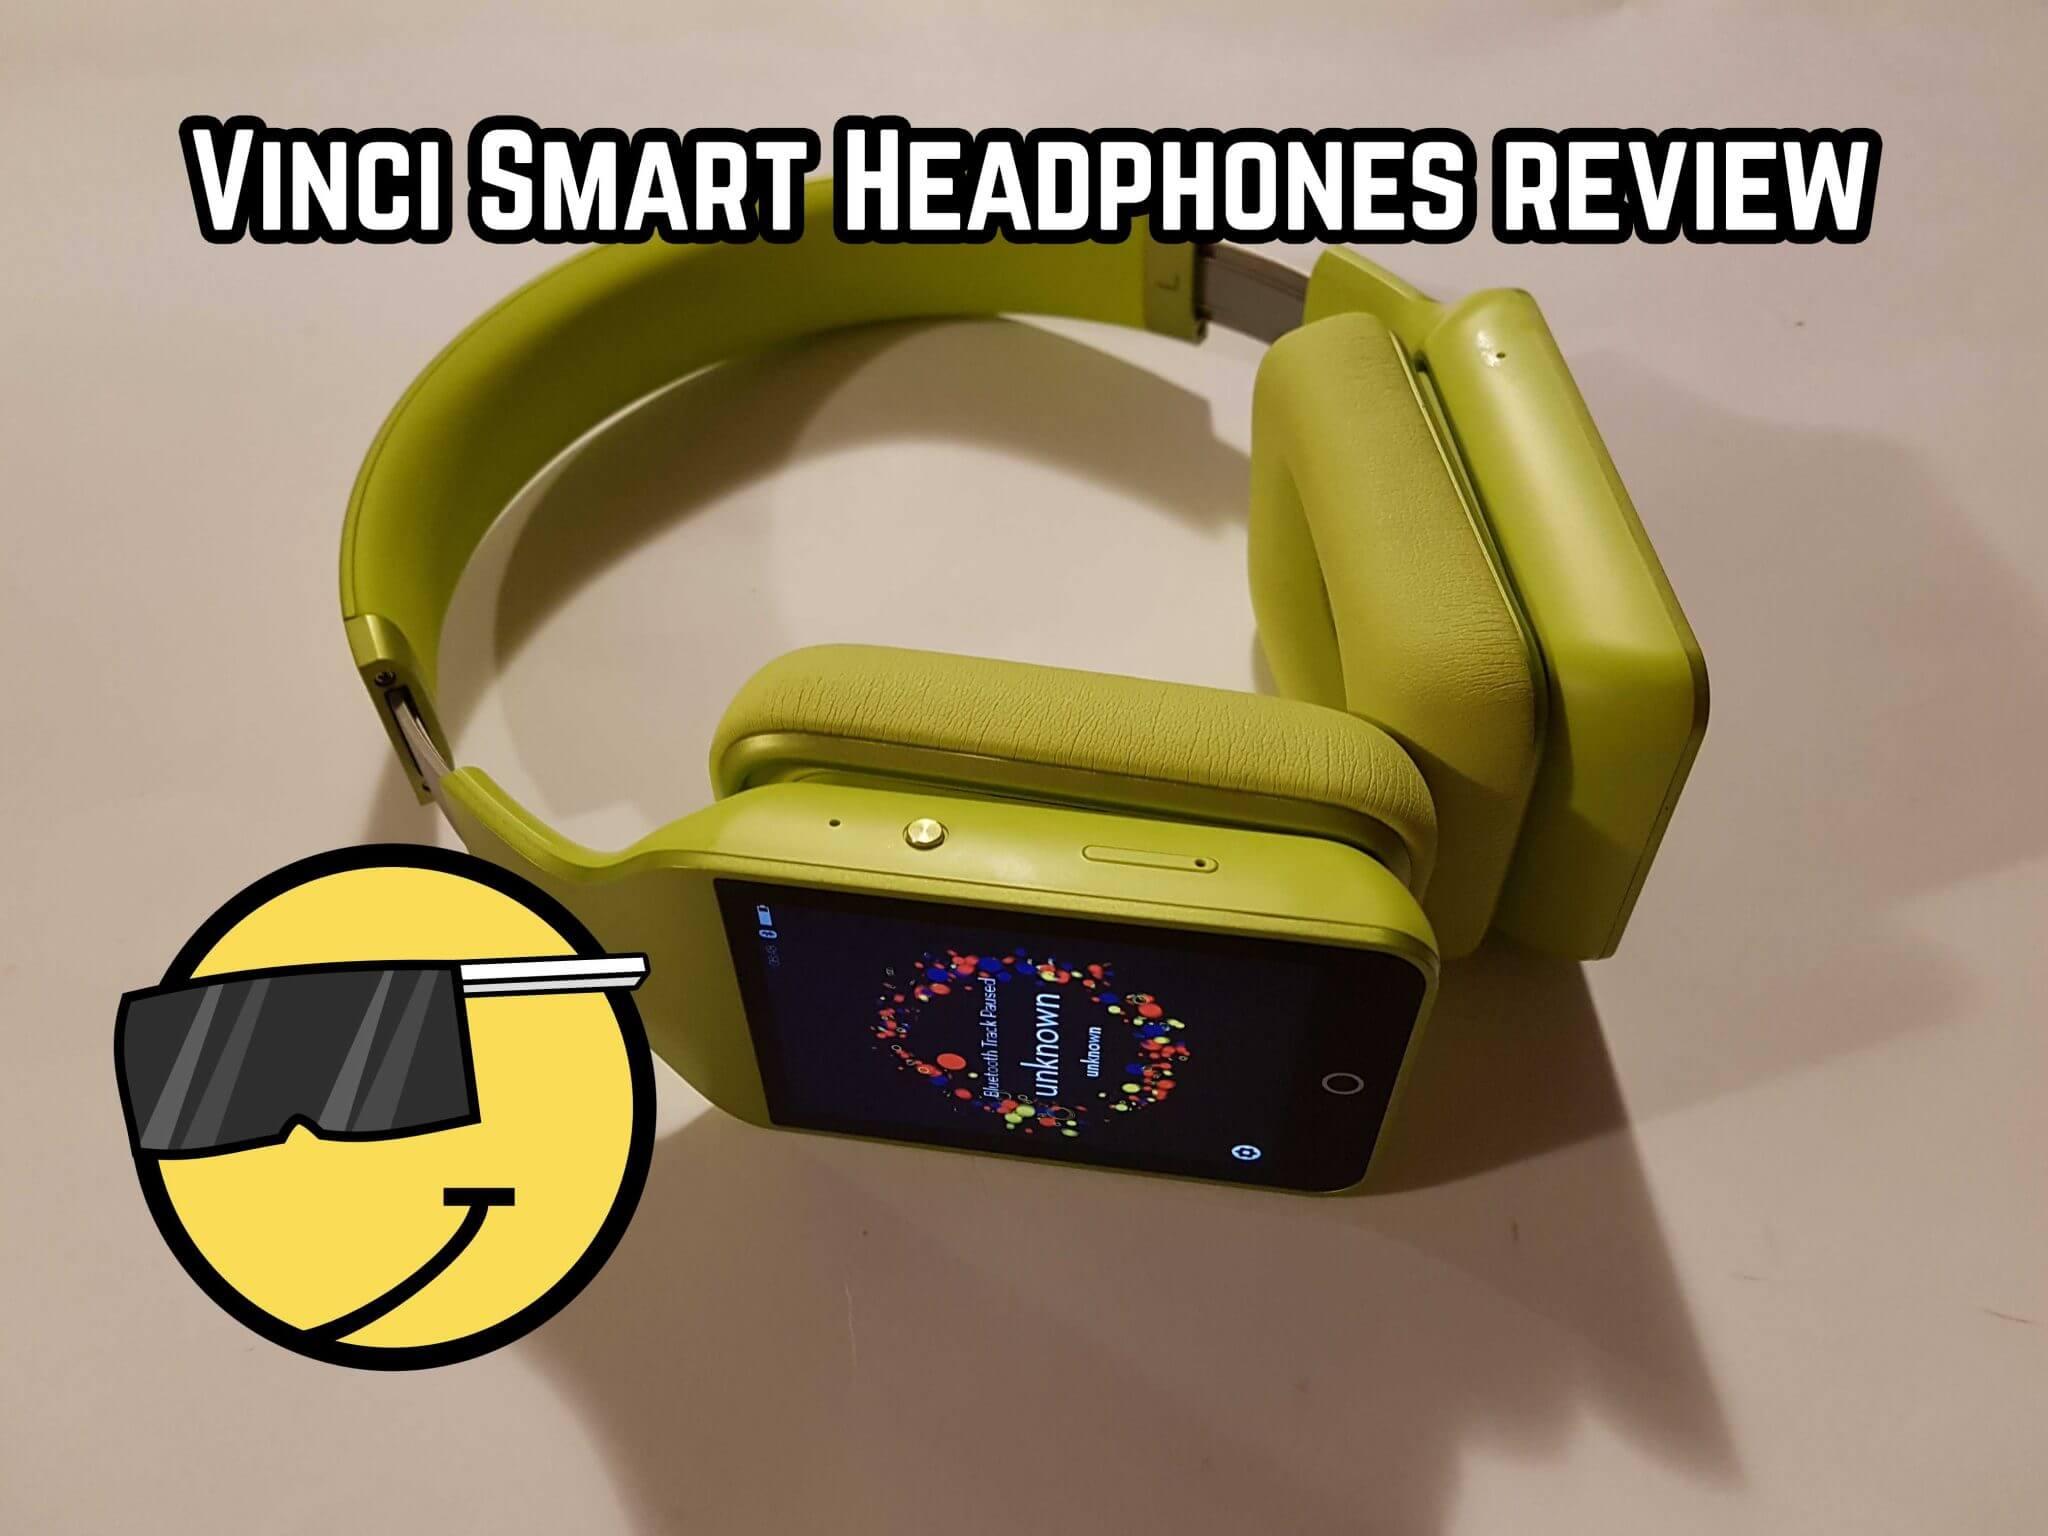 article photo: Vinci Smart Headphones review